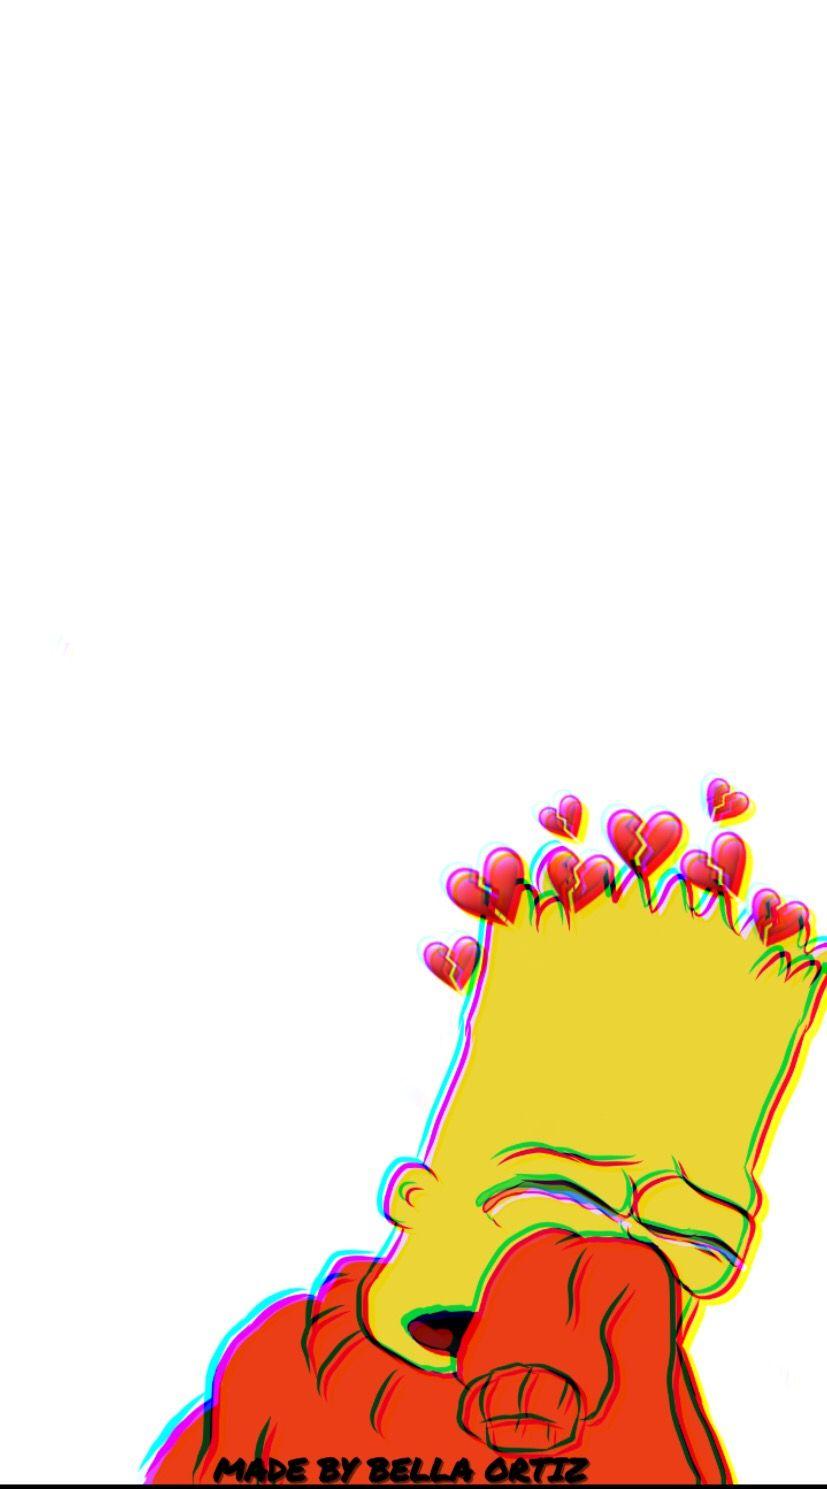 I Drew And Edited Thisss Bart Simoson Iphone Wallpaper - Broken Heart Wallpaper Iphone - HD Wallpaper